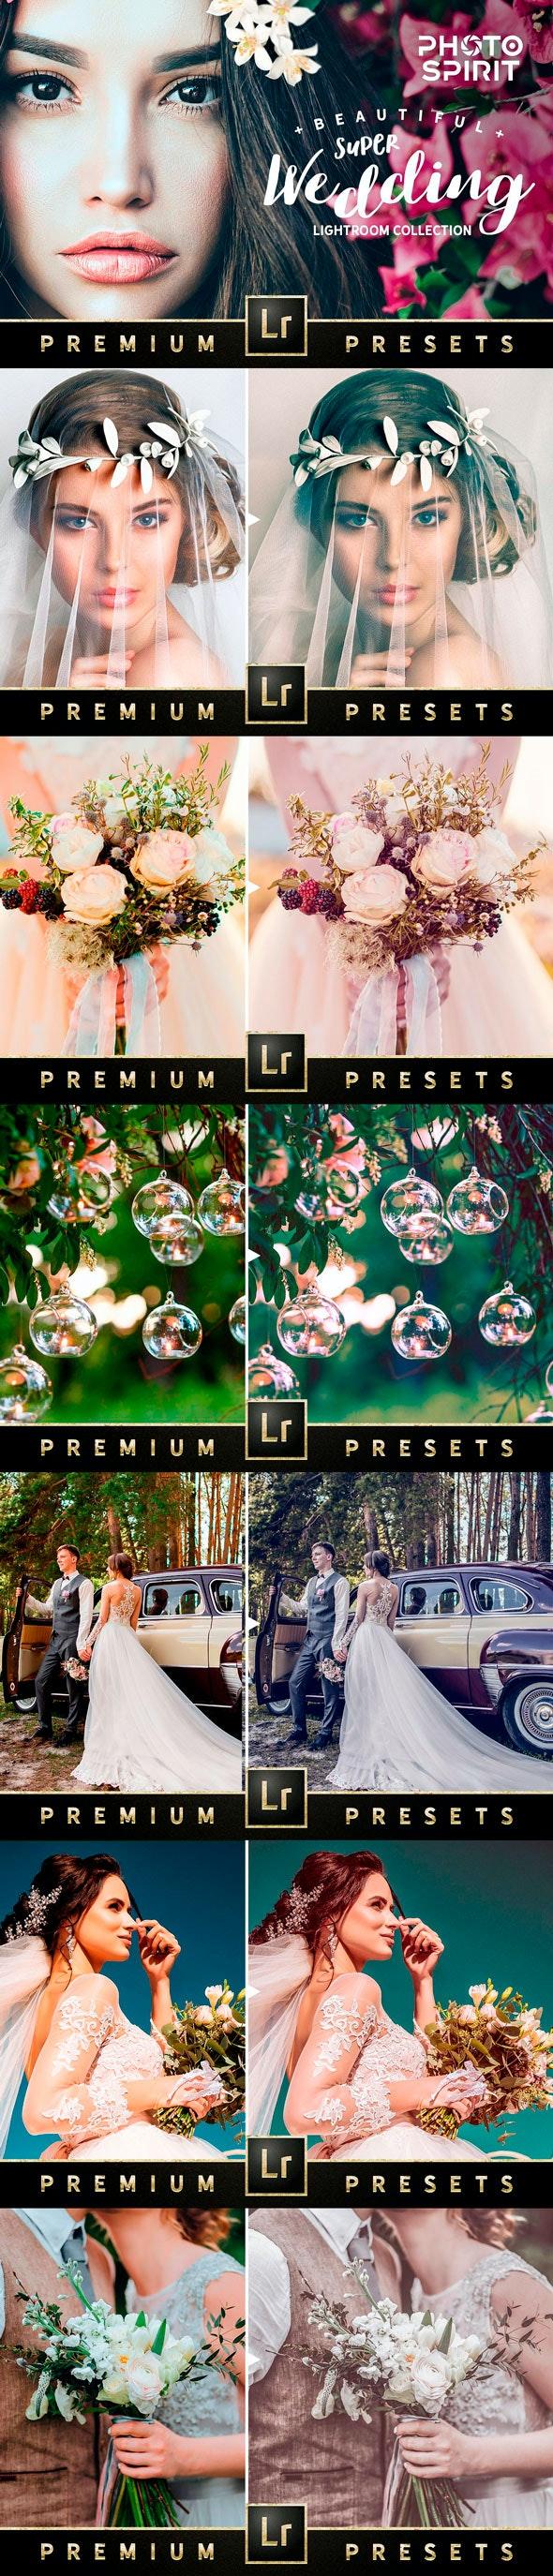 Premium Beautiful Wedding Presets - Wedding Lightroom Presets